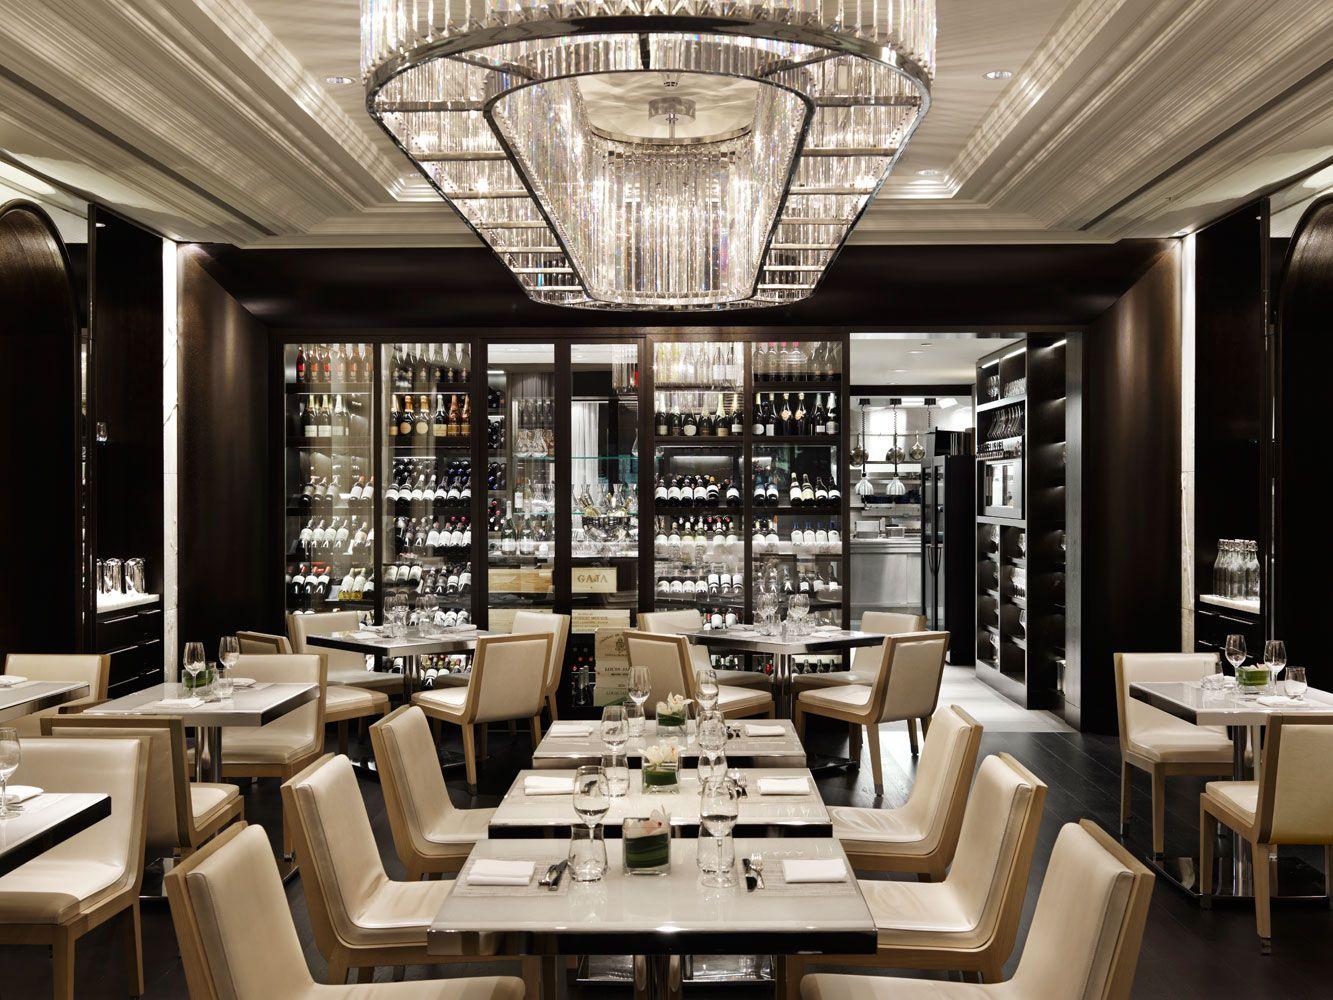 Hawksworth restaurant vancouver bc canada interior